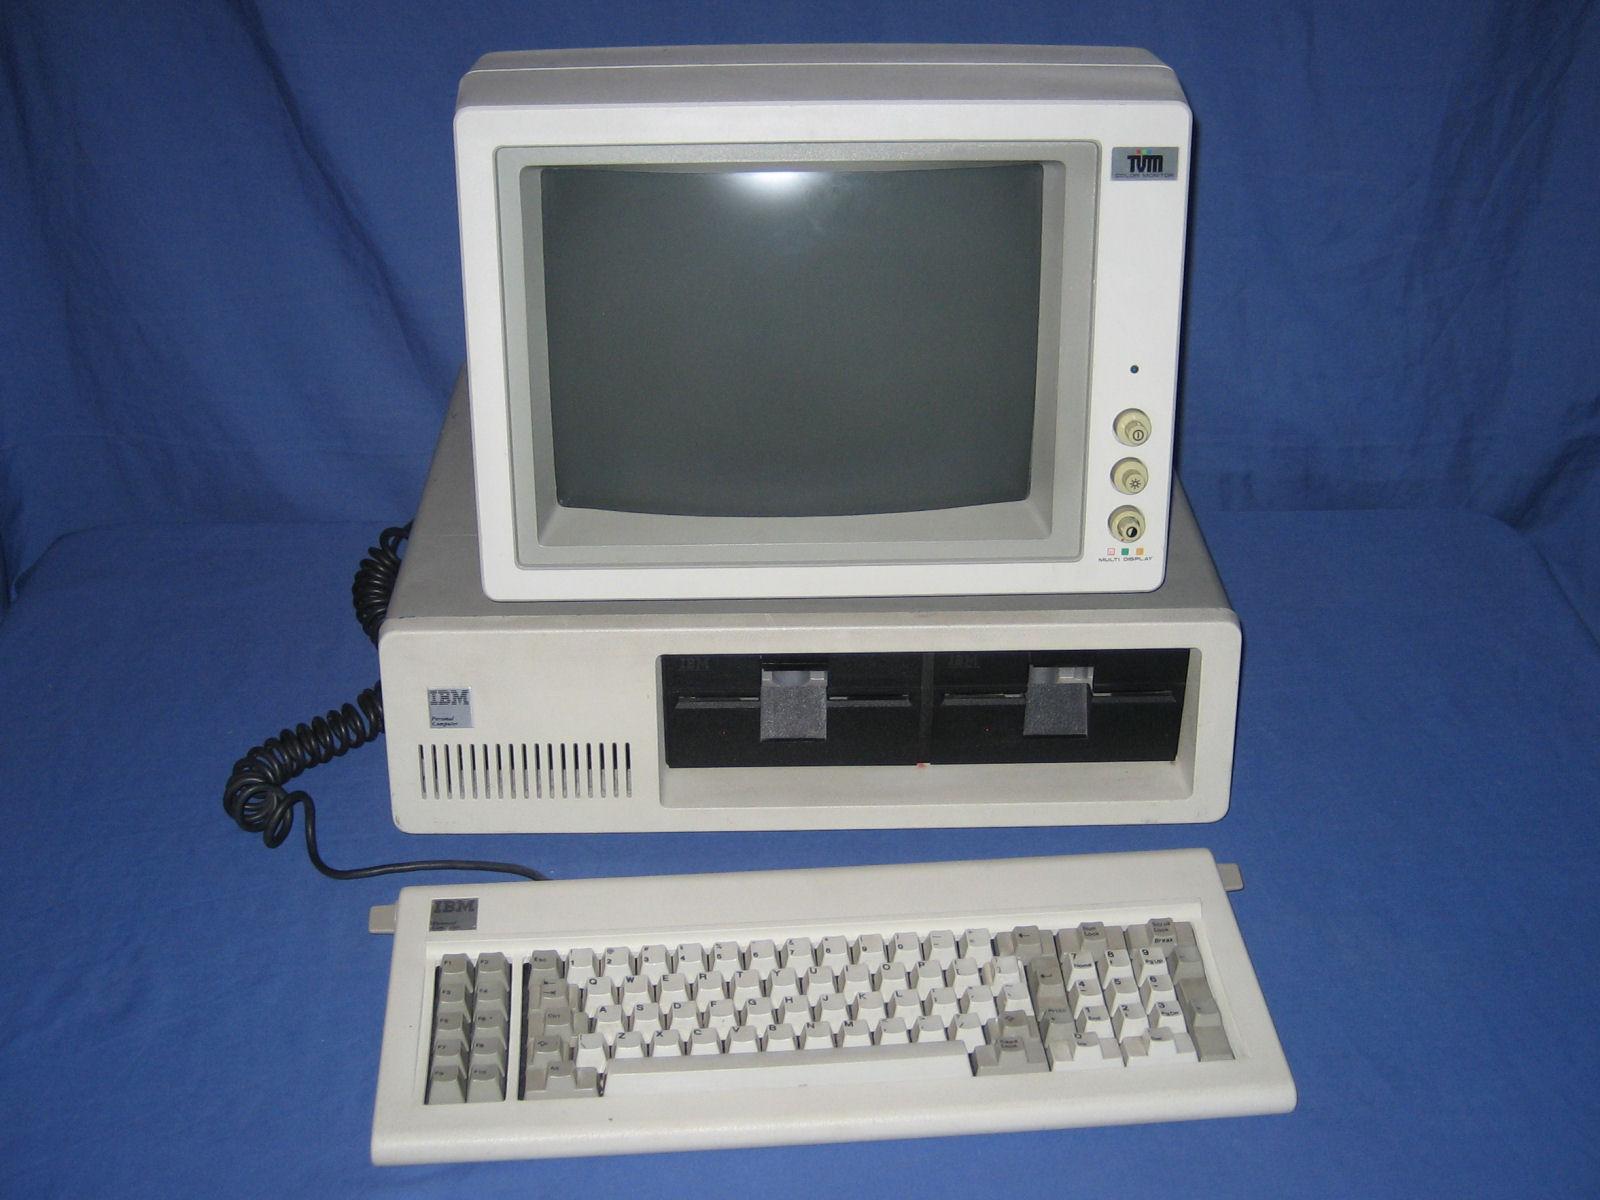 IBM PC 5150 Computerspopcorncx